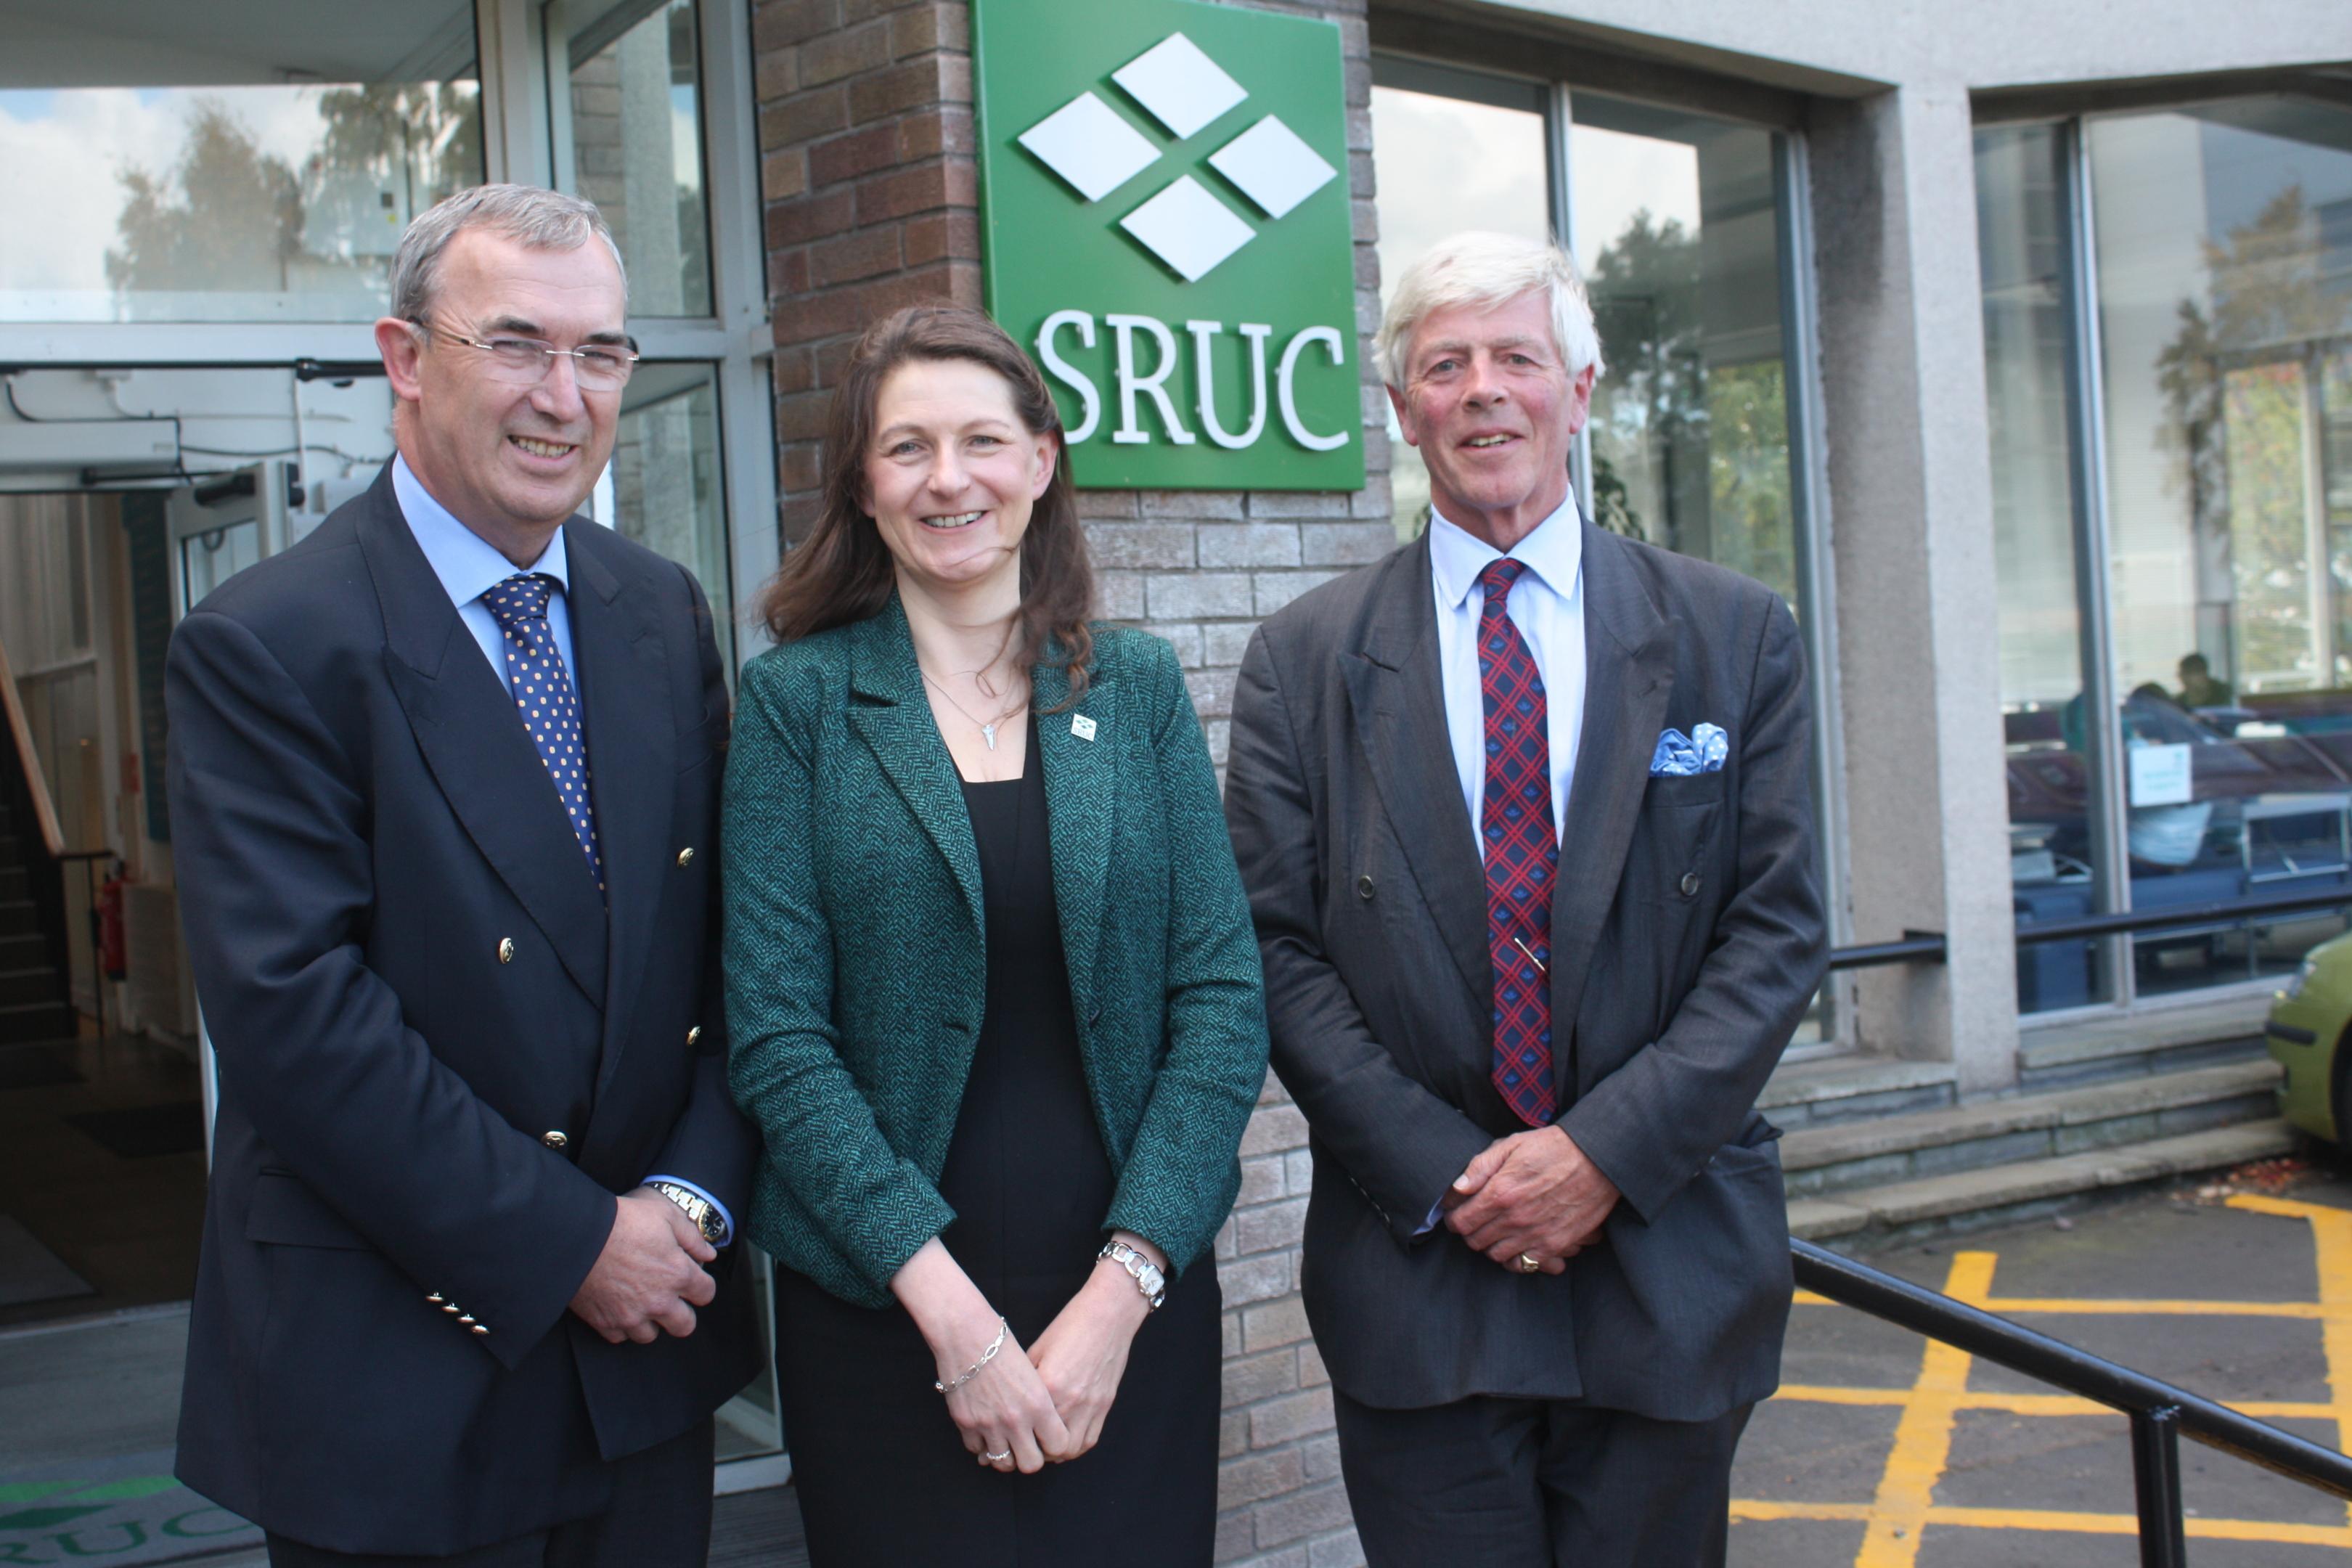 Pat Machray, Janet Swadling and Lord Jamie Lindsay